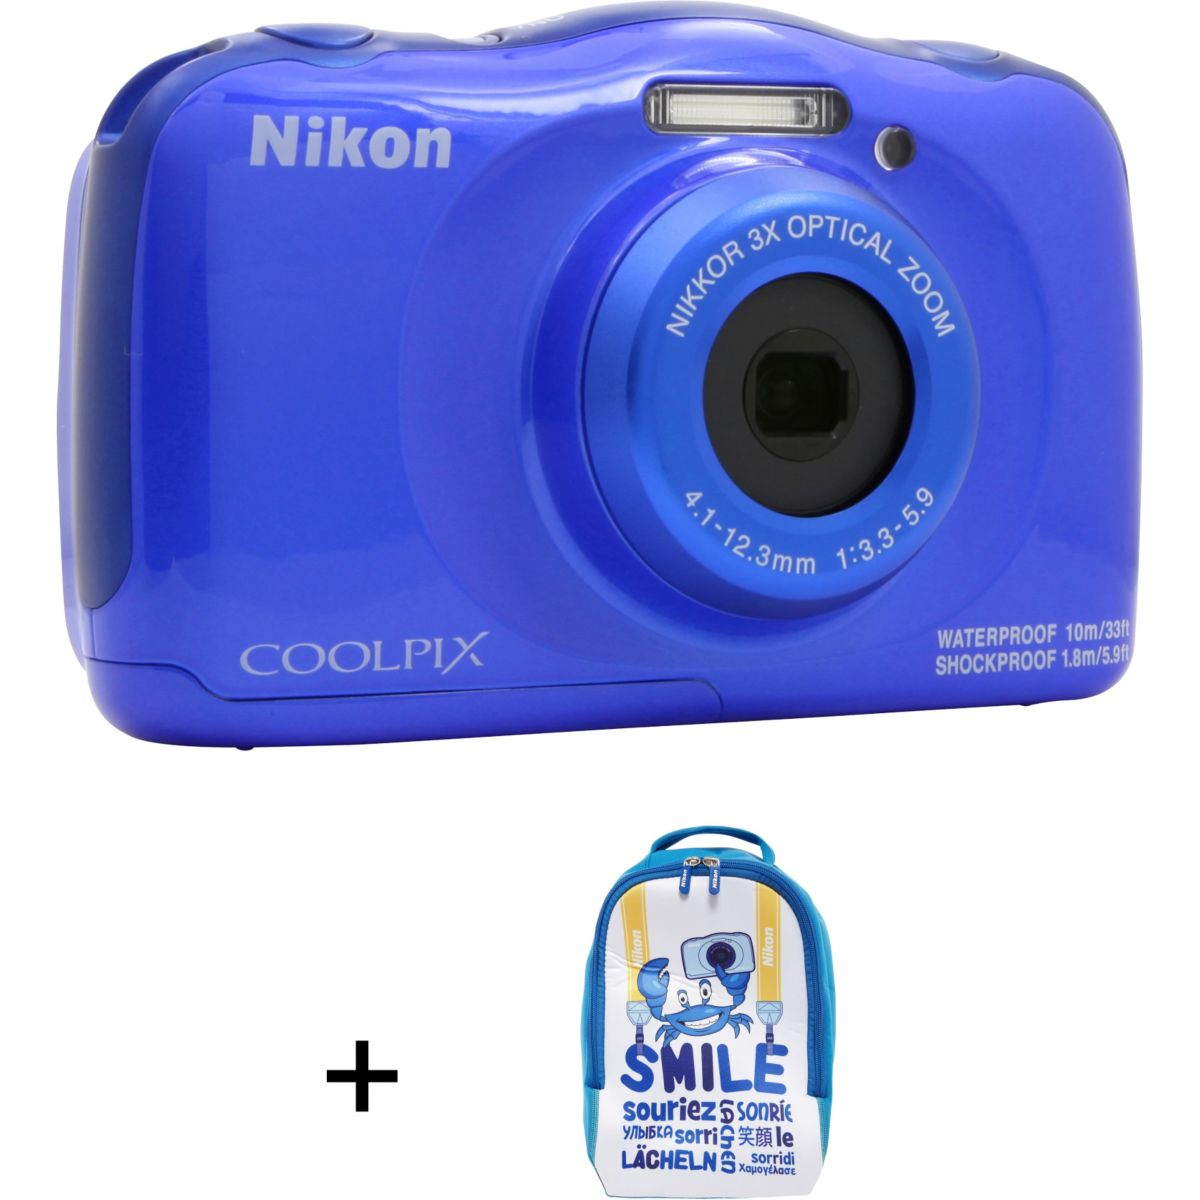 Appareil photo Compact NIKON Coolpix W100 Bleu + sac à dos